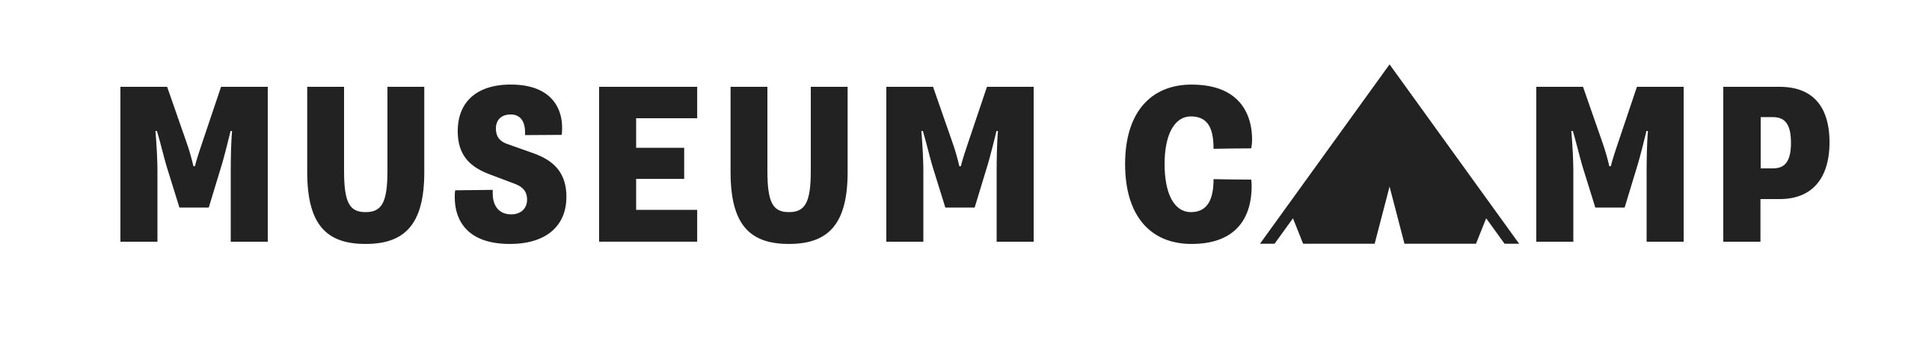 Museumcamp